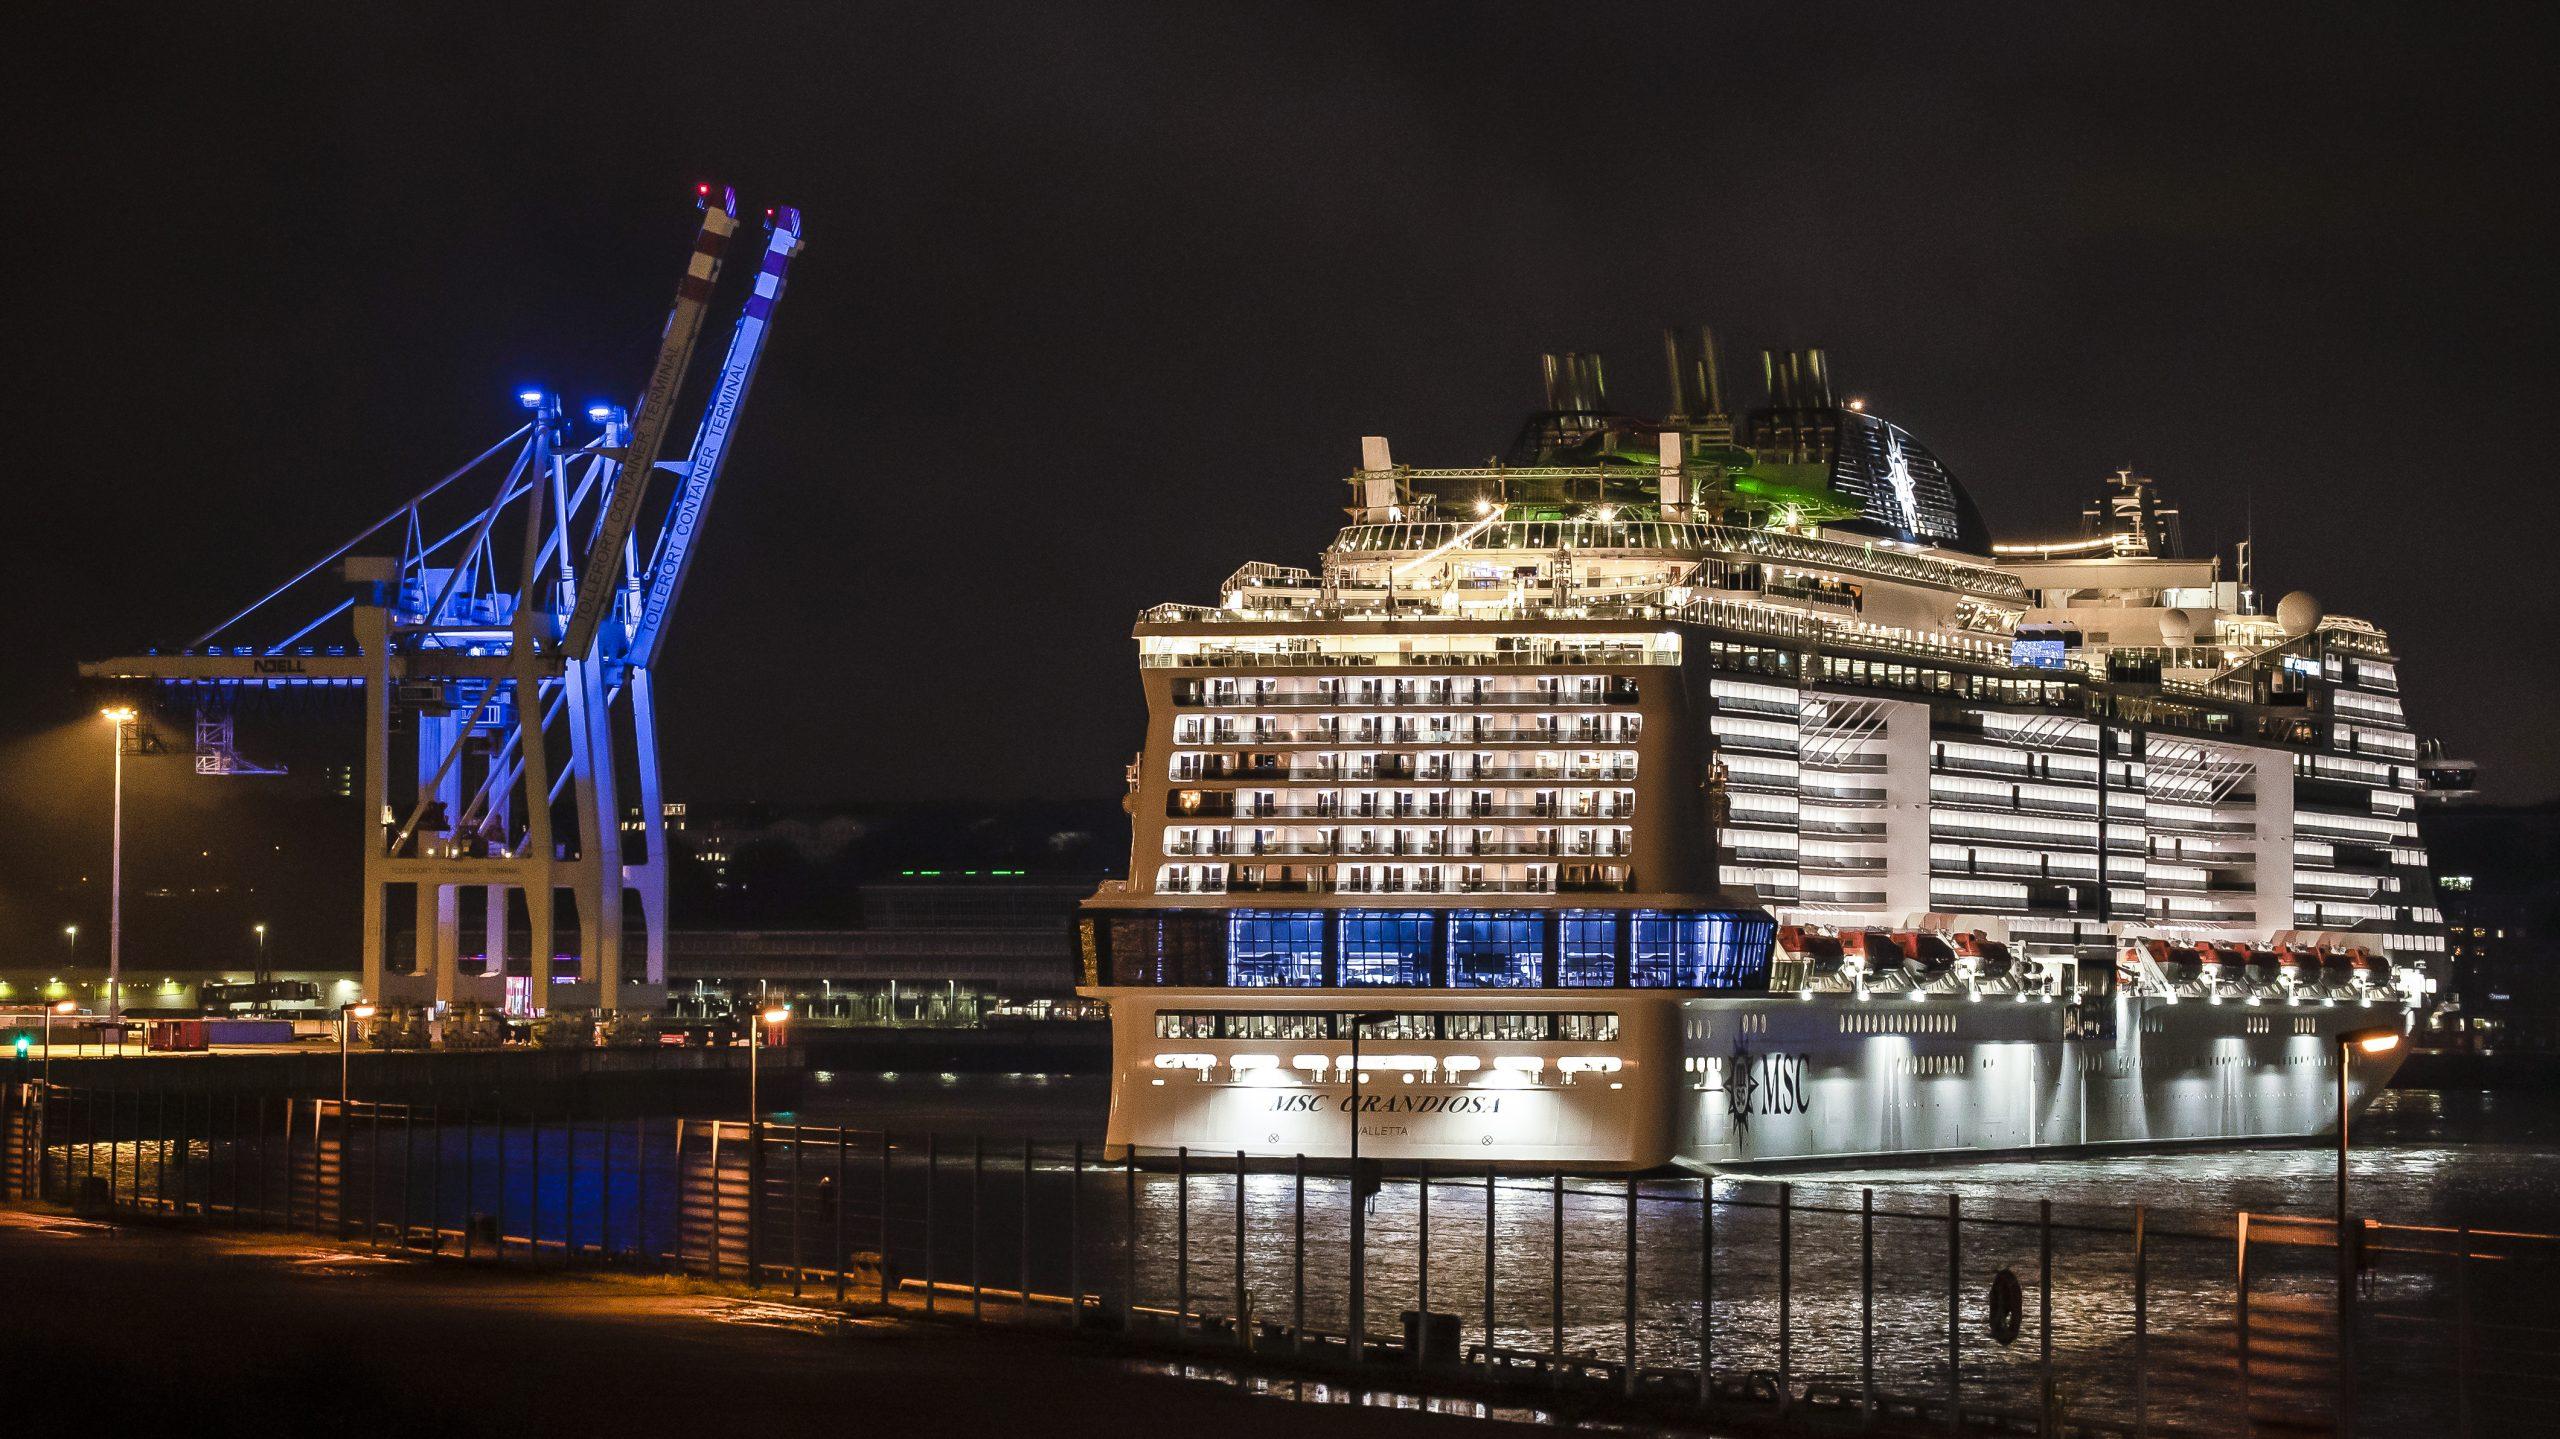 6 November 2019, MSC Grandiosa arrives in Hamburg (Ph. credit Perspektive Media)